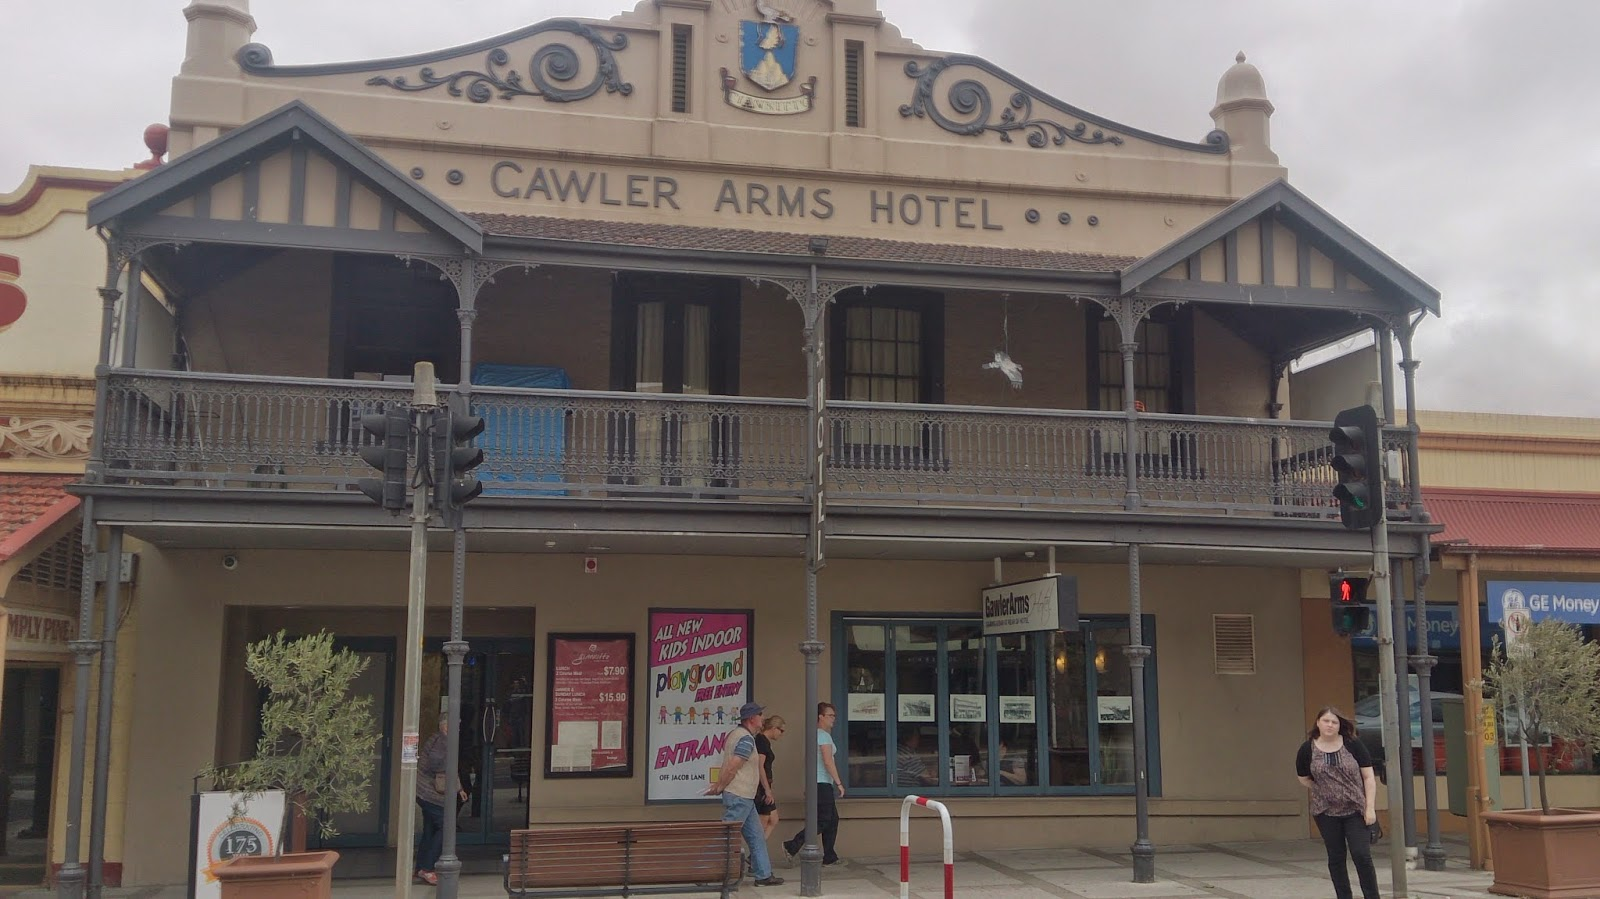 Gawler Arms Hotel